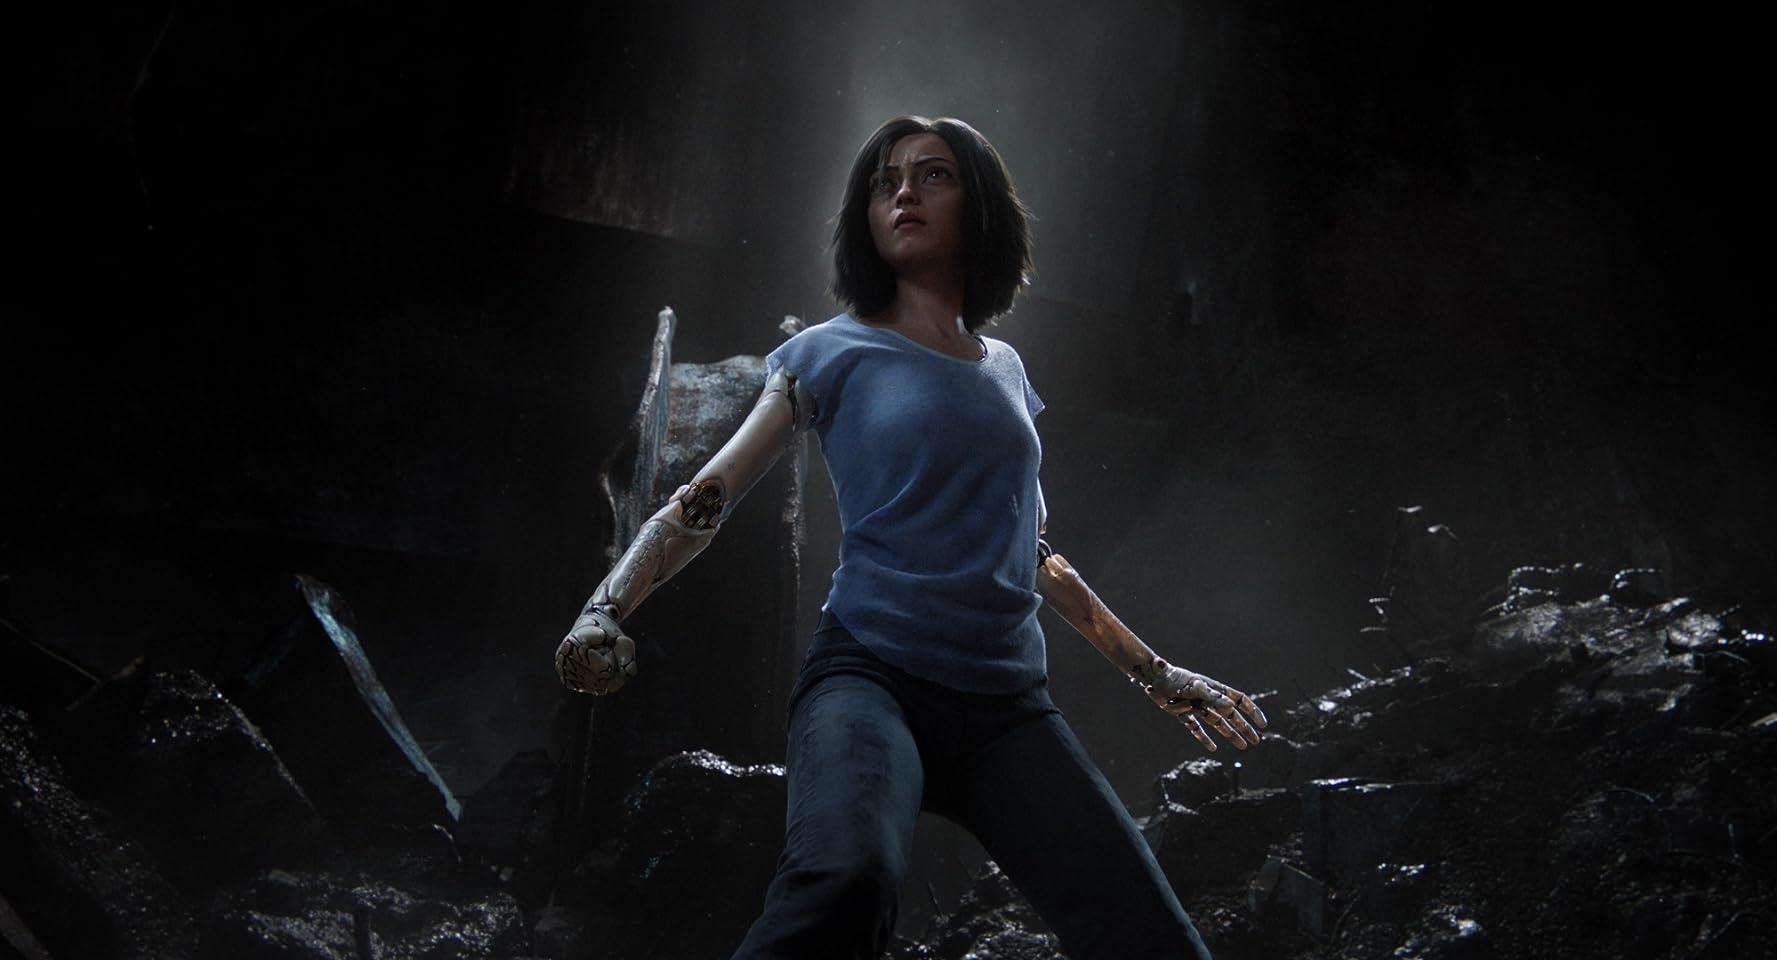 Rosa Salazar in Alita: Battle Angel (2019)